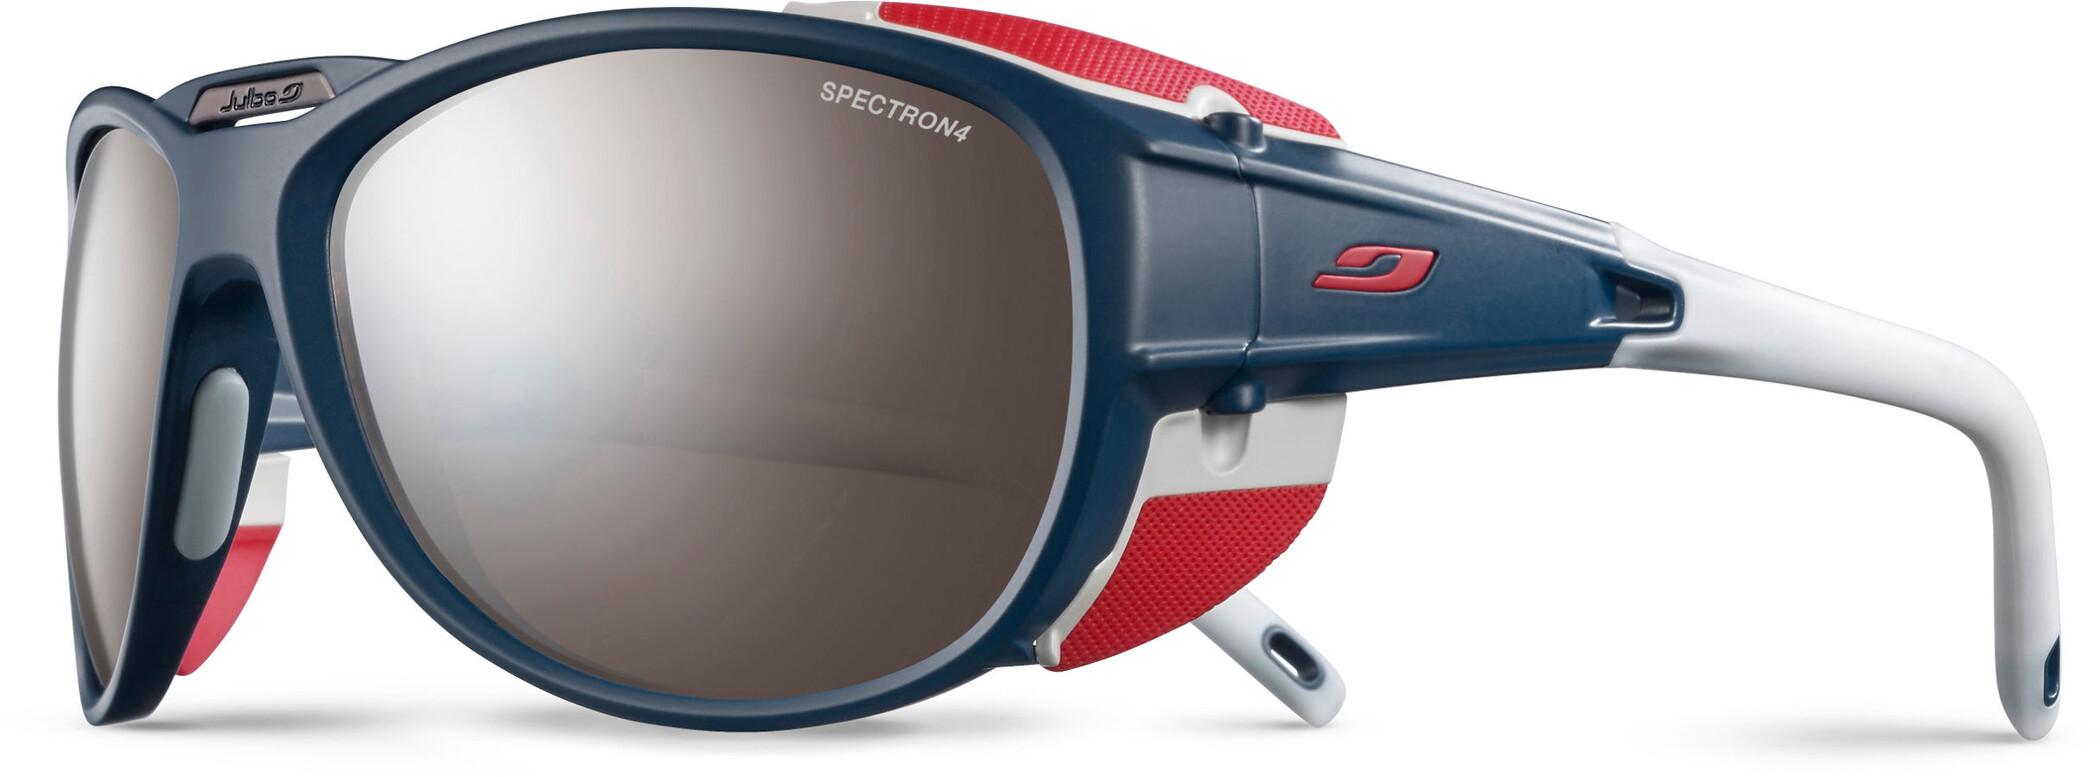 Julbo Exp*** 2.0 Spectron 4 Solbriller, matt blue/red-brown flash silver (2019) | Glasses